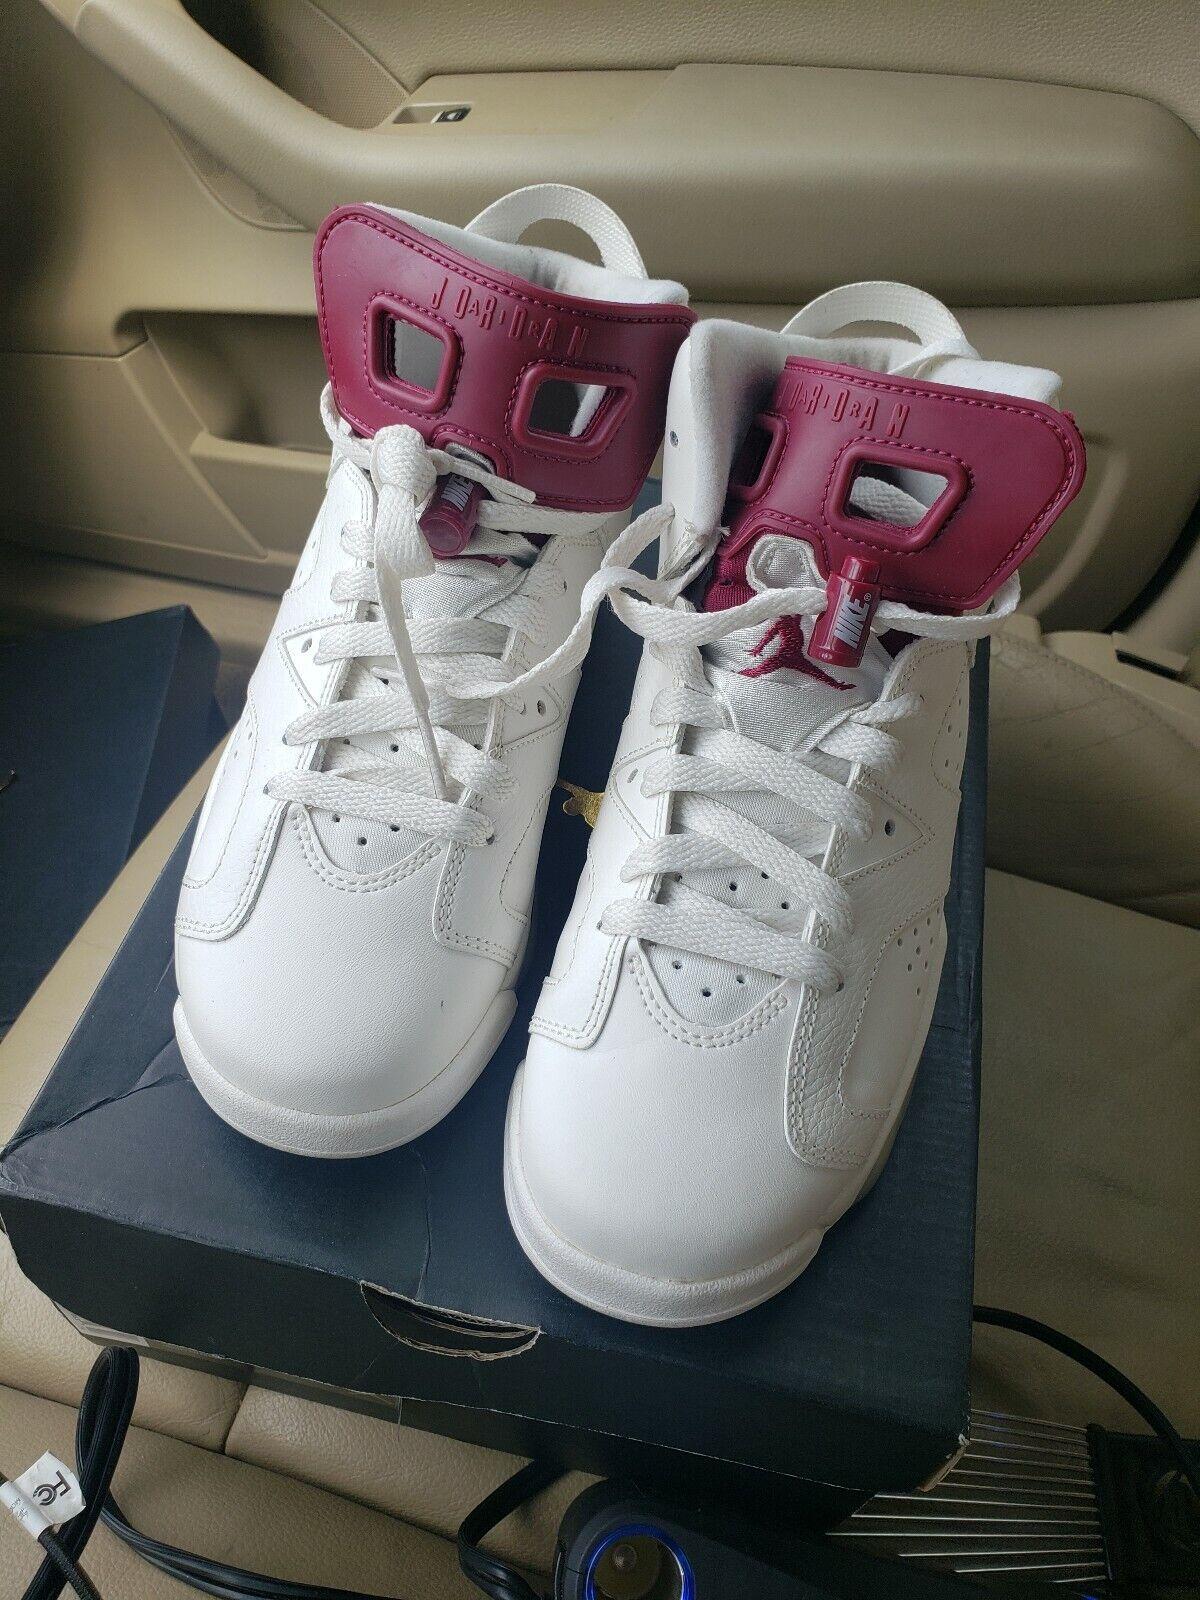 Nike Air Jordan 6 retro white, new maroon youth size 6.5